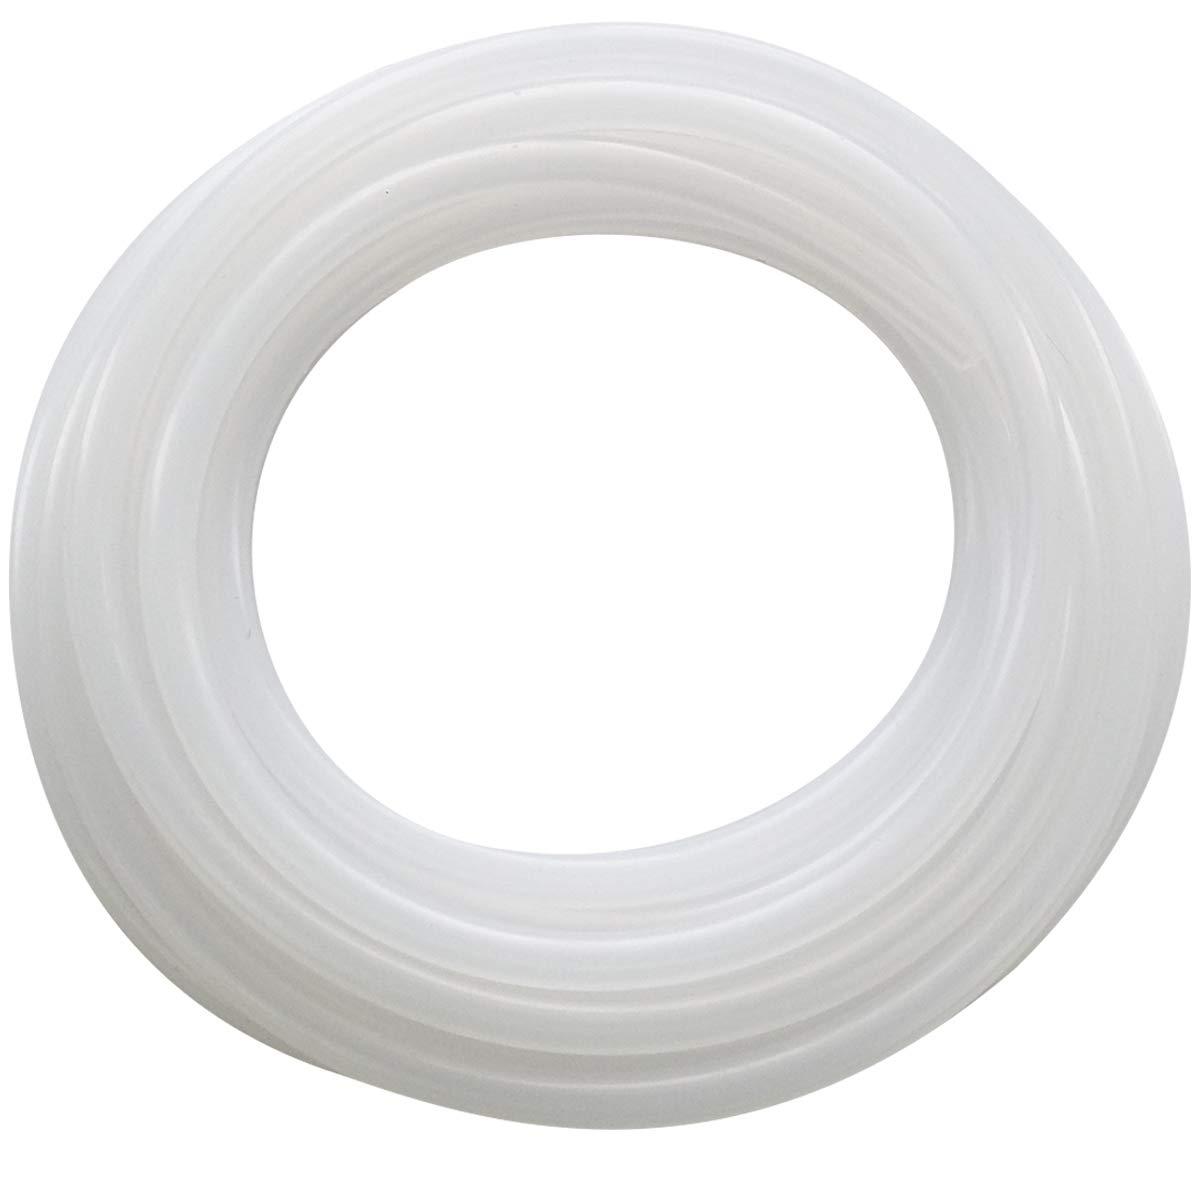 Pure Silicone Tubing-Flexible Hose Pipe Food Grade Hoses, High Temp Tube, 1/4